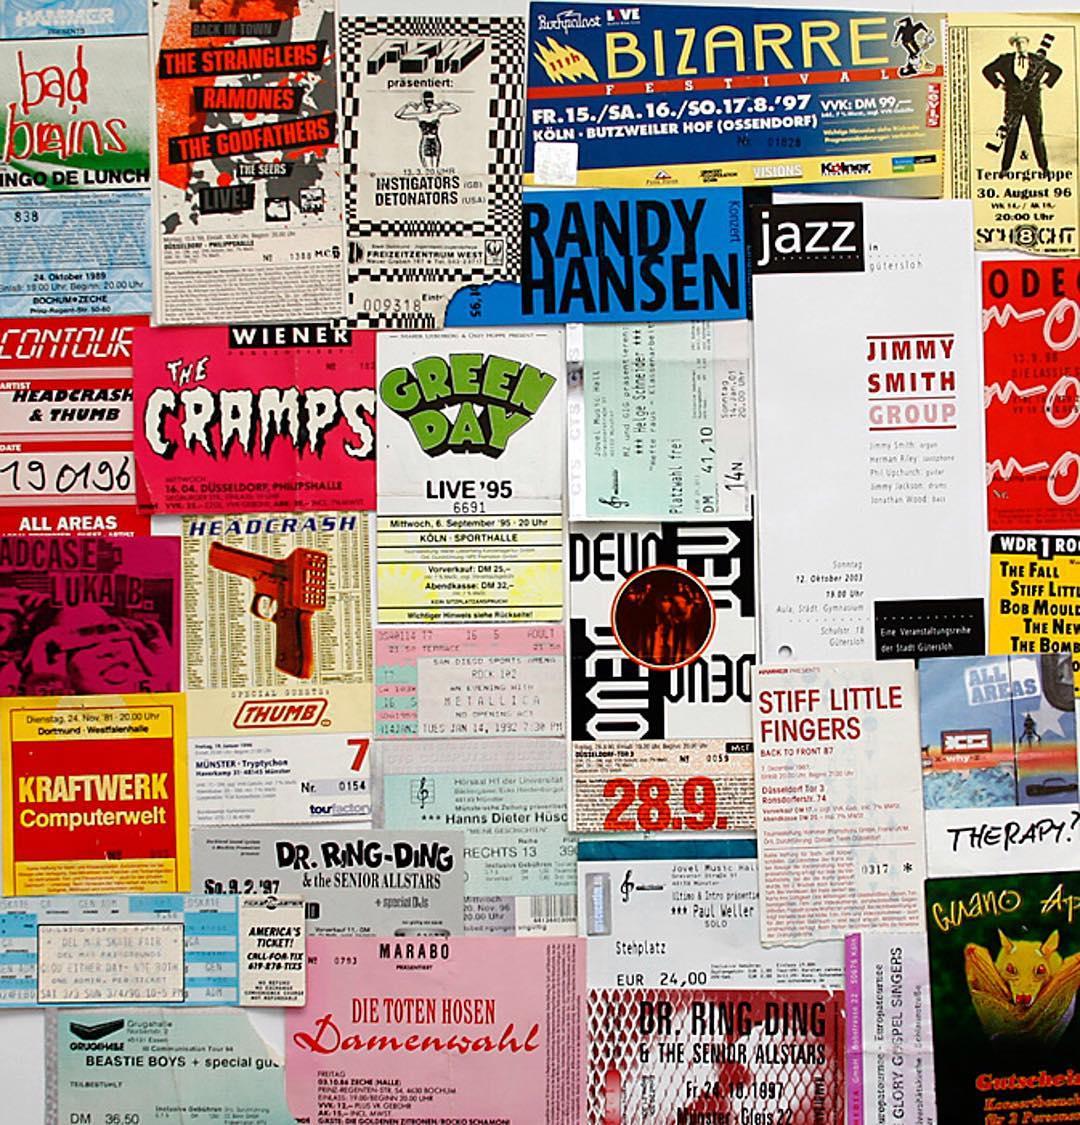 #throwbackthursday some old concert tickets. They used to look cool. #Musik #music #bands #Gigs #concert #tickets #badbrains #ramones #thecramps #devo #stifflittlefingers #slf #beastieboys #totenhosen #thumb #metallica #greenday #helgeschneider #jimmysmith #kraftwerk #bailgun